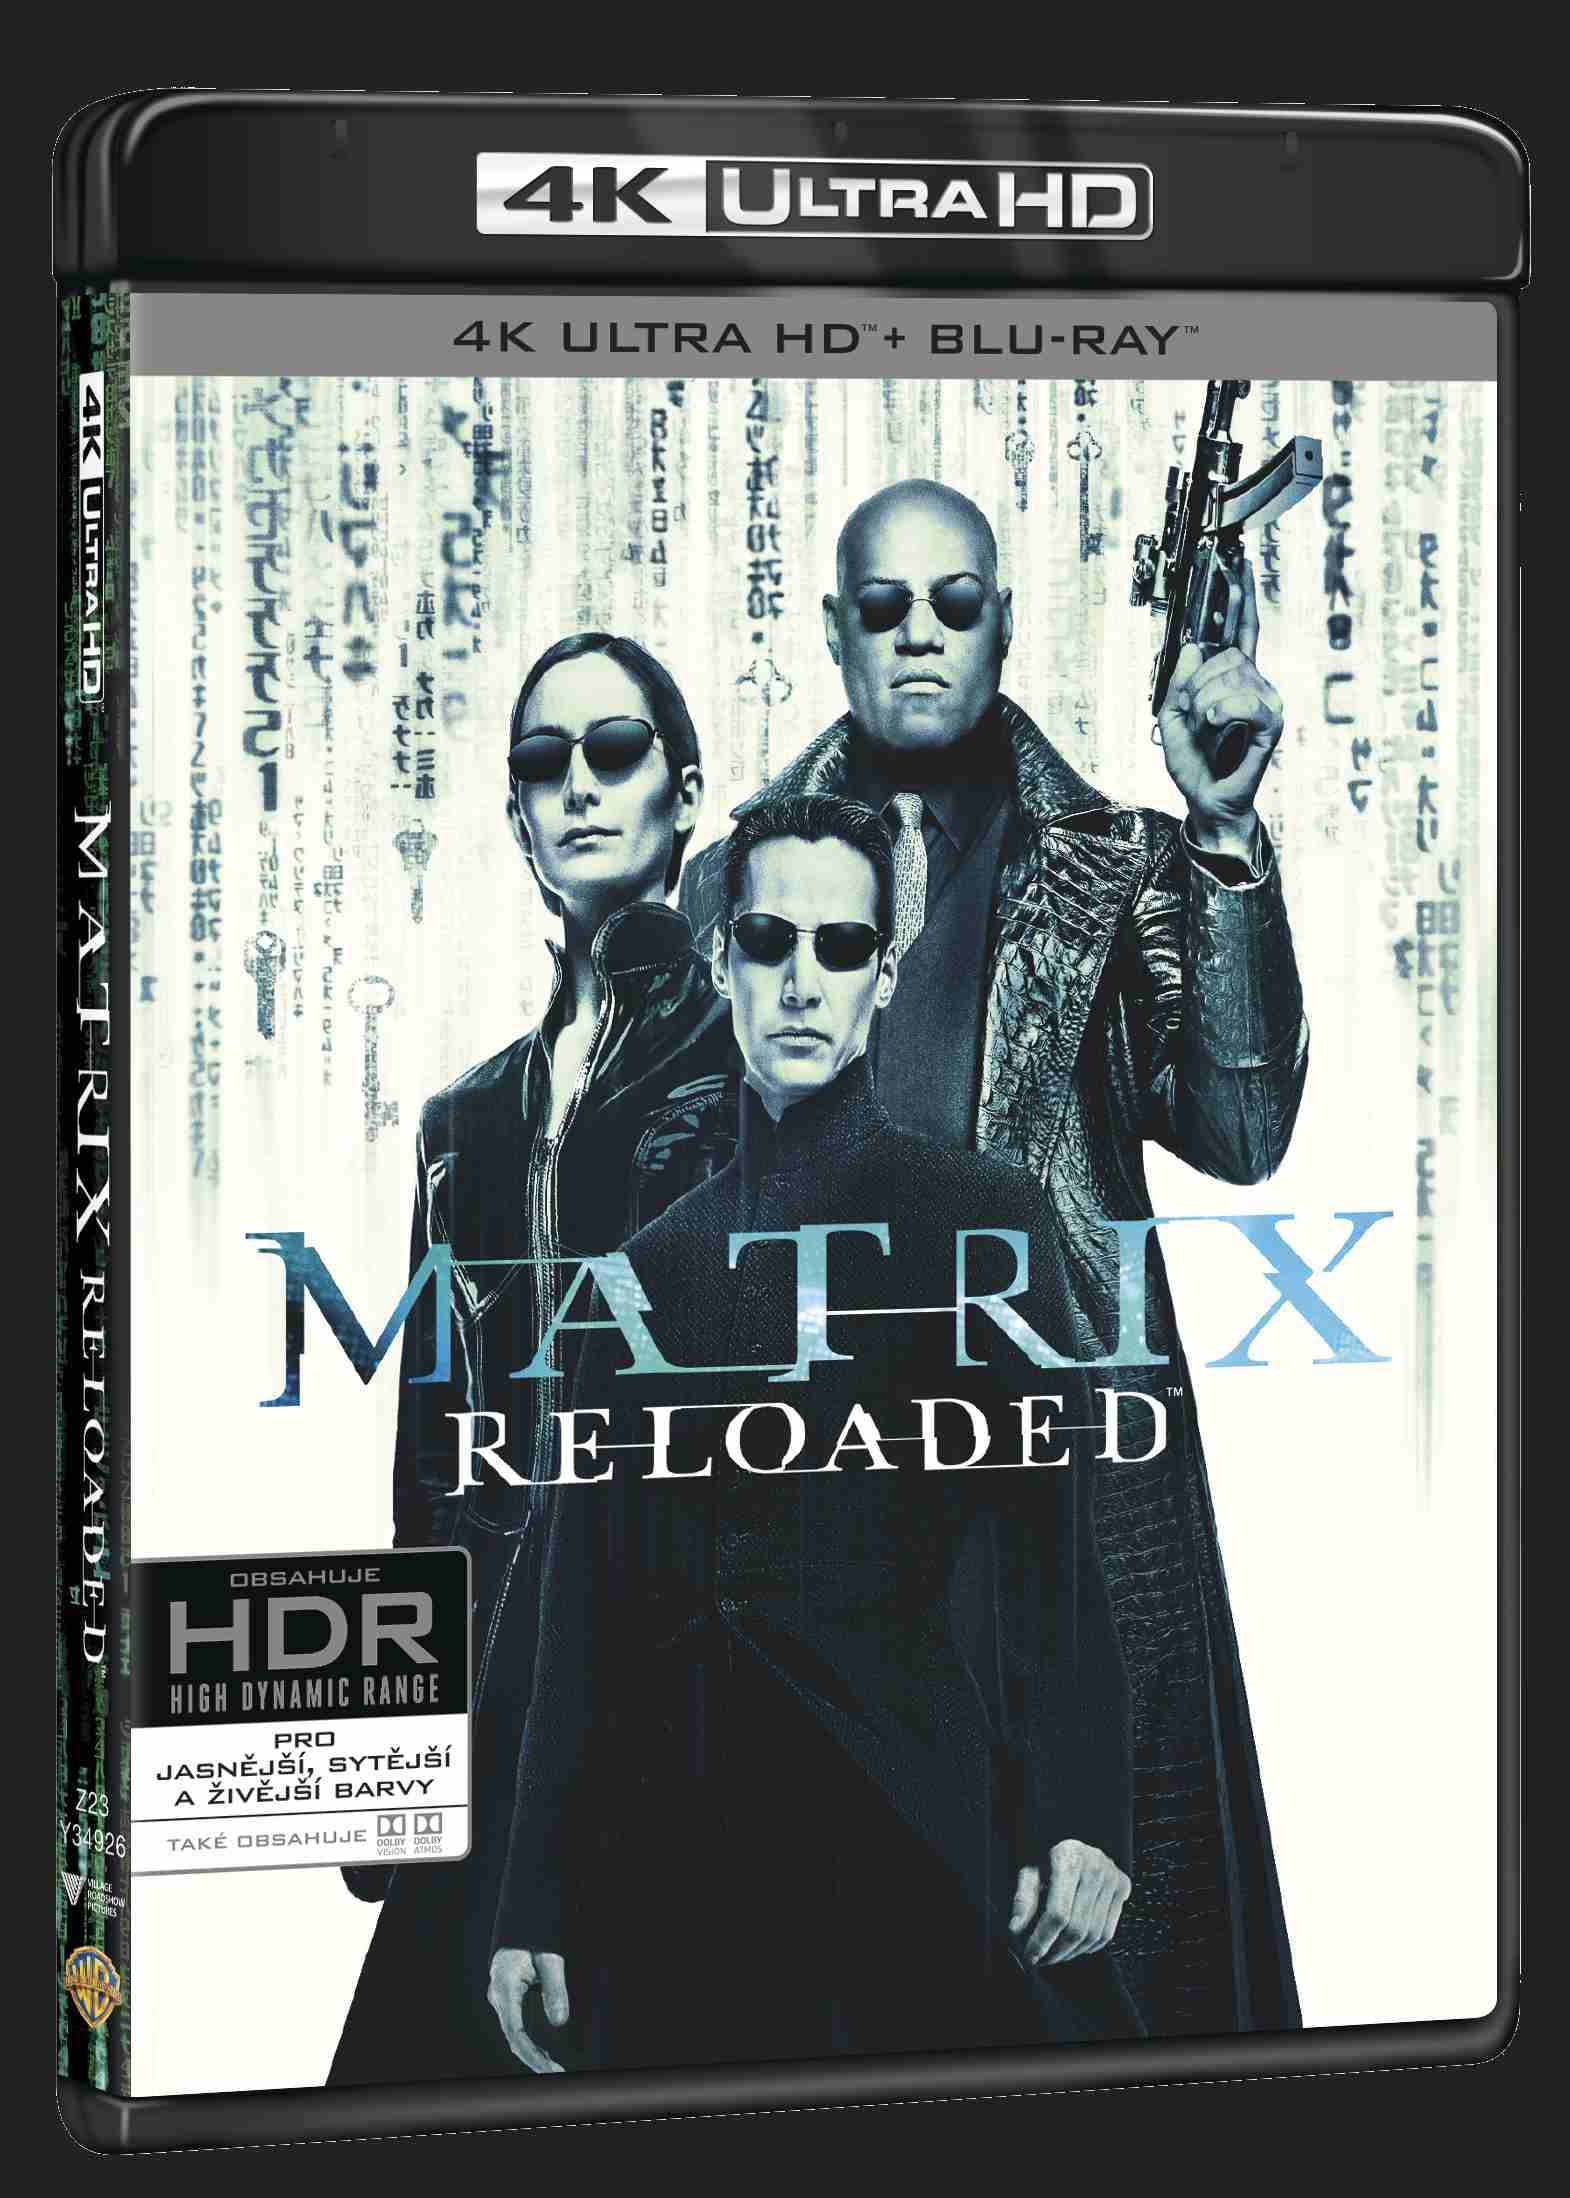 Matrix Reloaded (4K ULTRA HD) - UHD Blu-ray + Blu-ray + Bonus disc (3 BD)